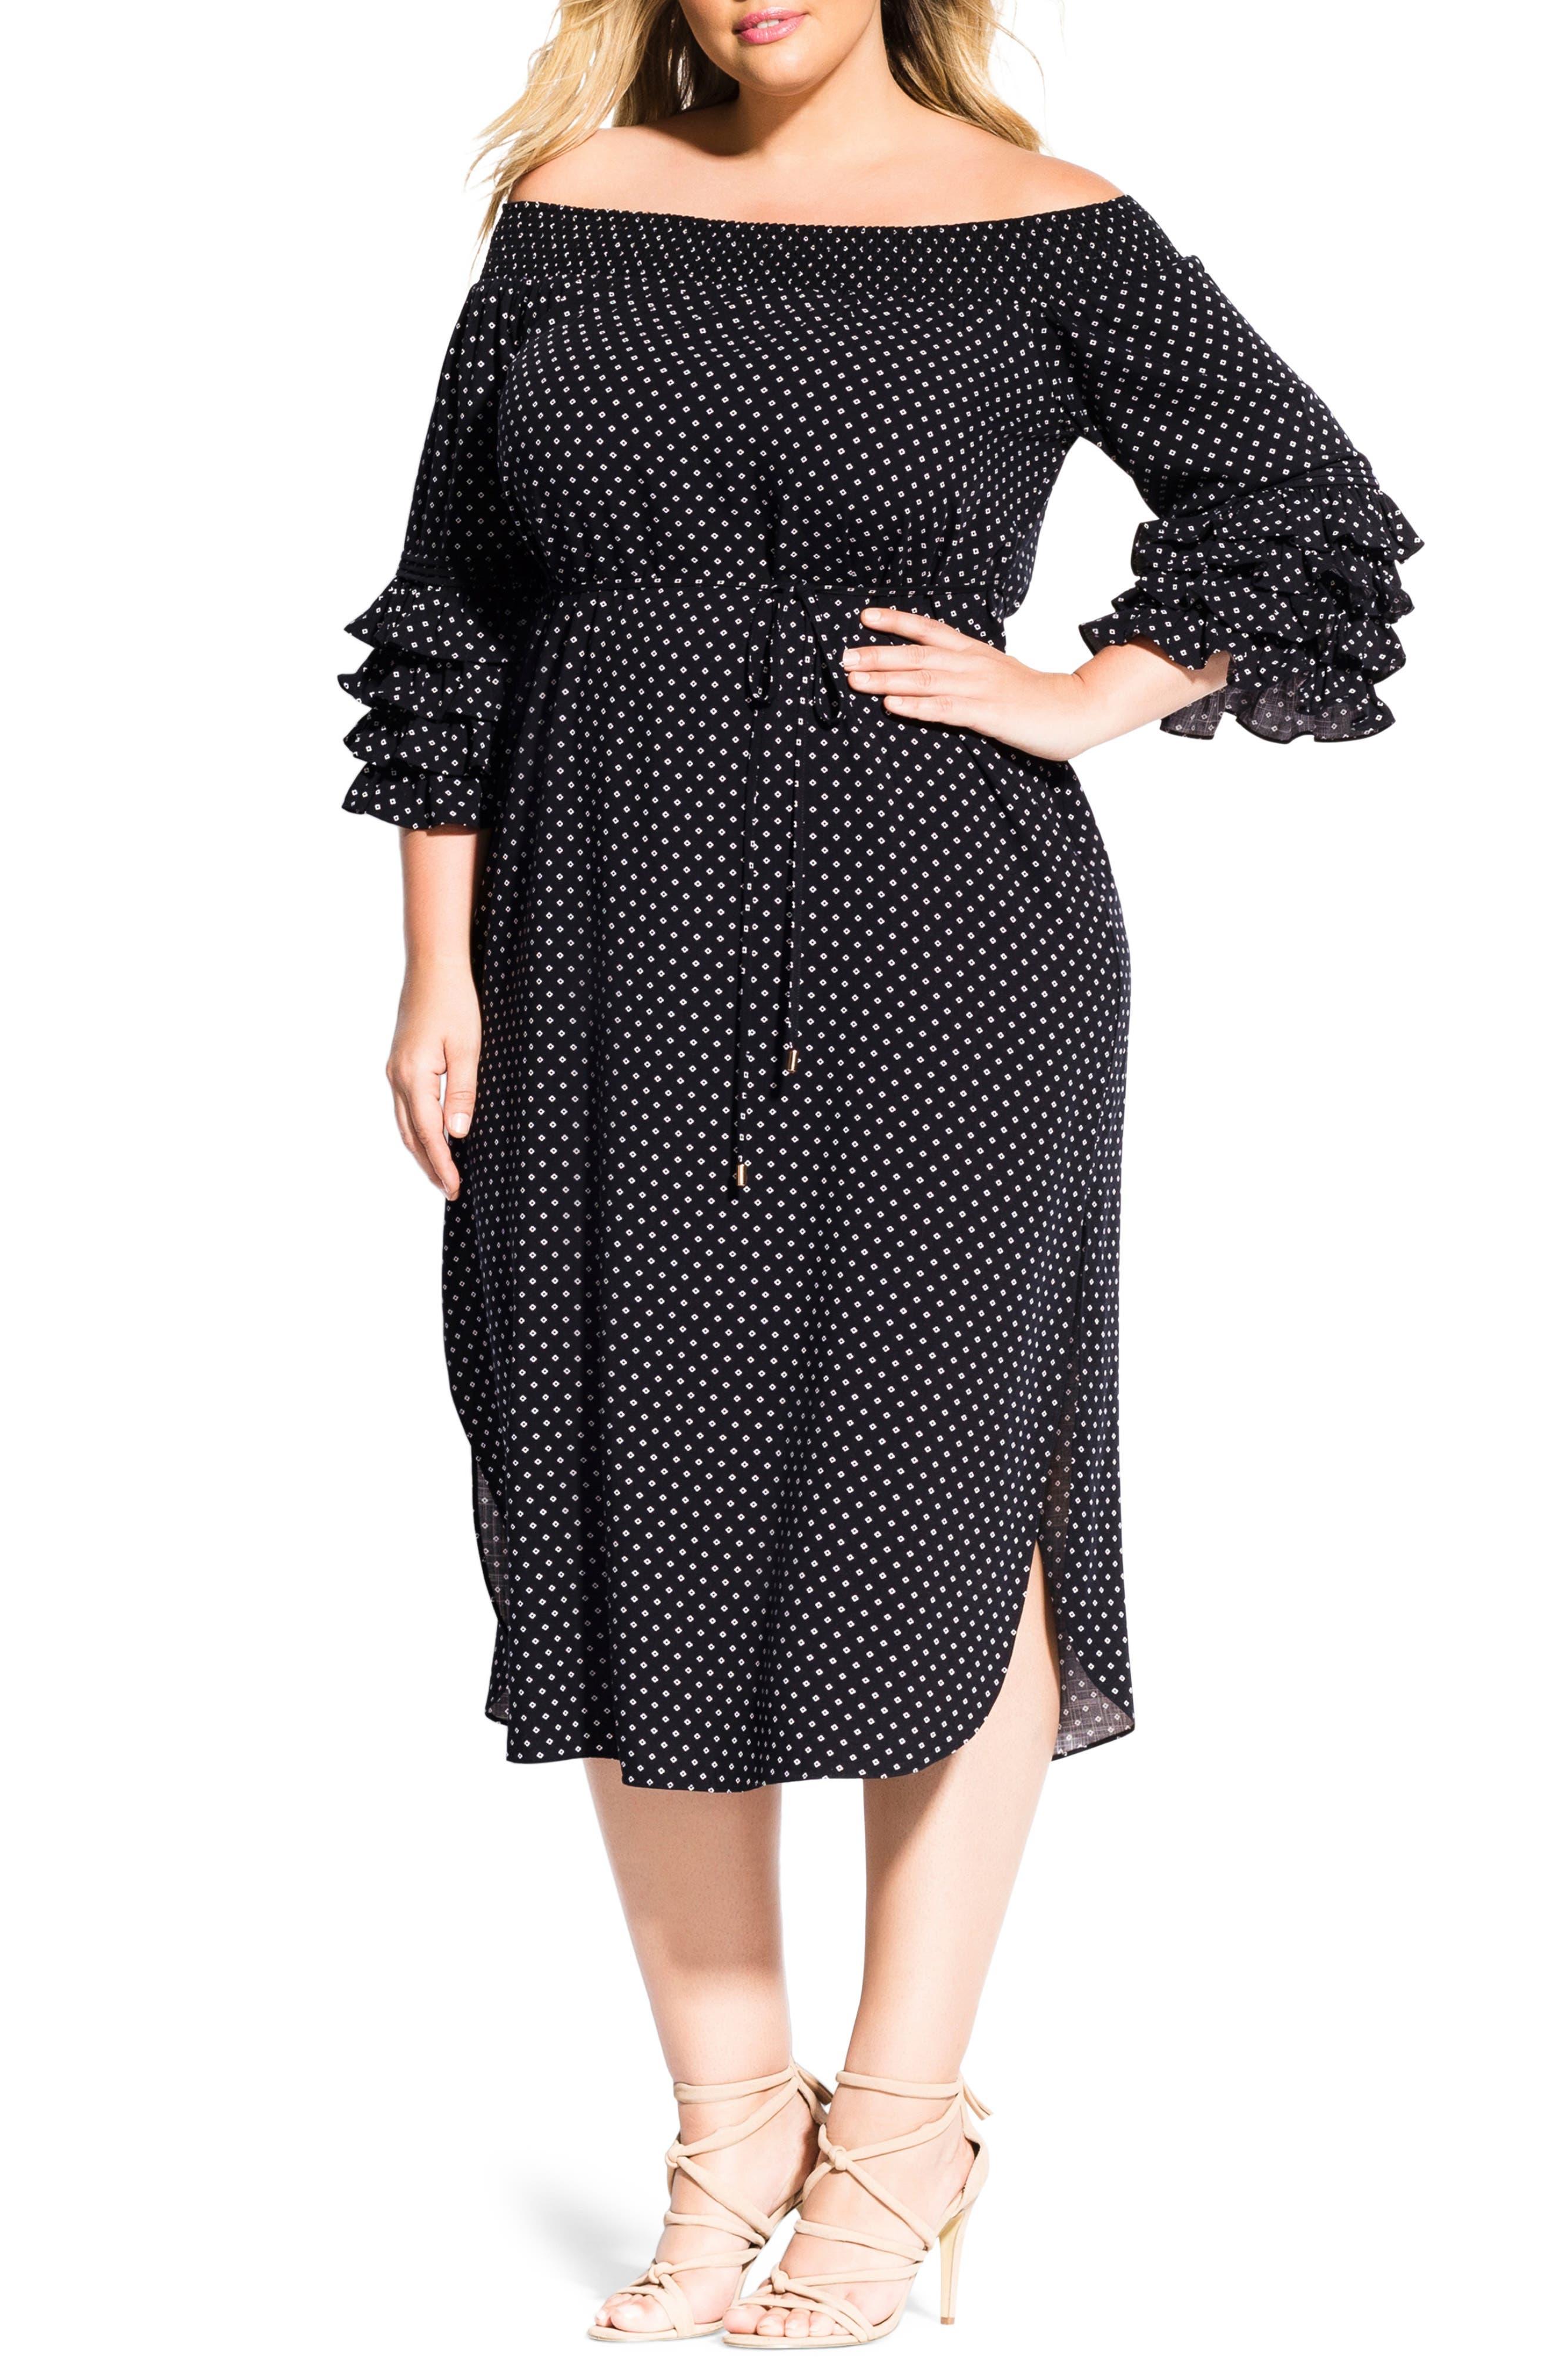 Plus Size City Chic Polka Dot Off The Shoulder Dress, Black